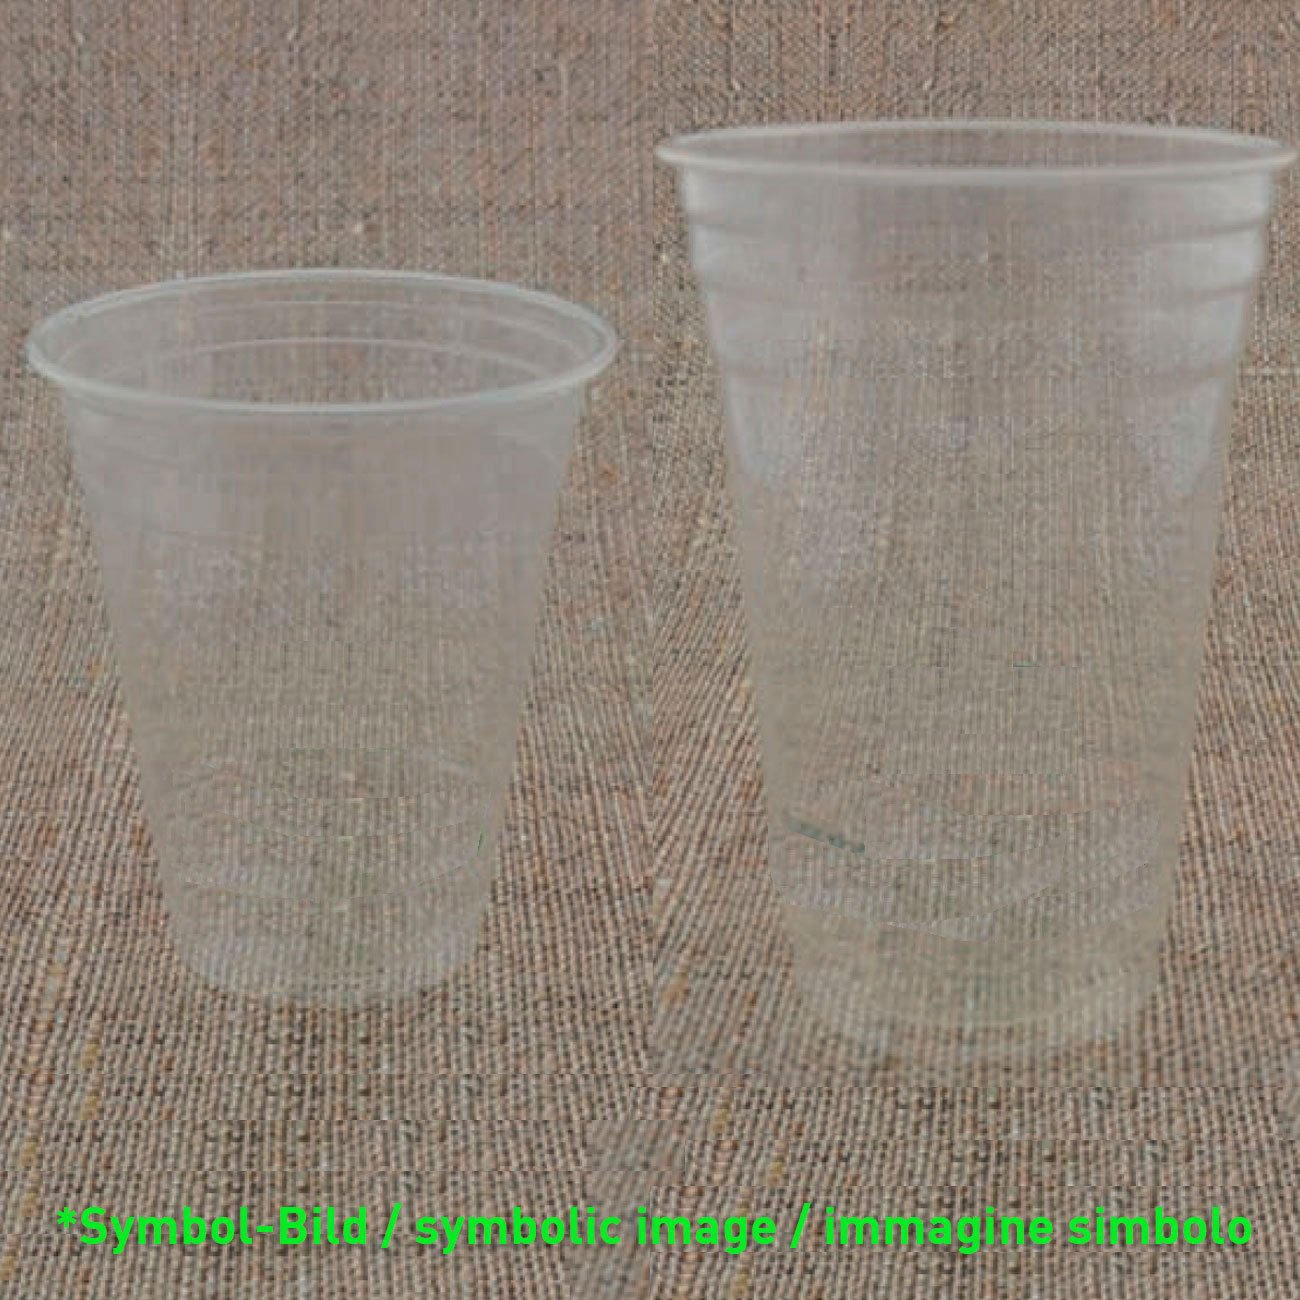 Clear cup 300 - 300 ccm - Karton 1.000 Stück - Trinkbecher aus Plastik Clear Cup